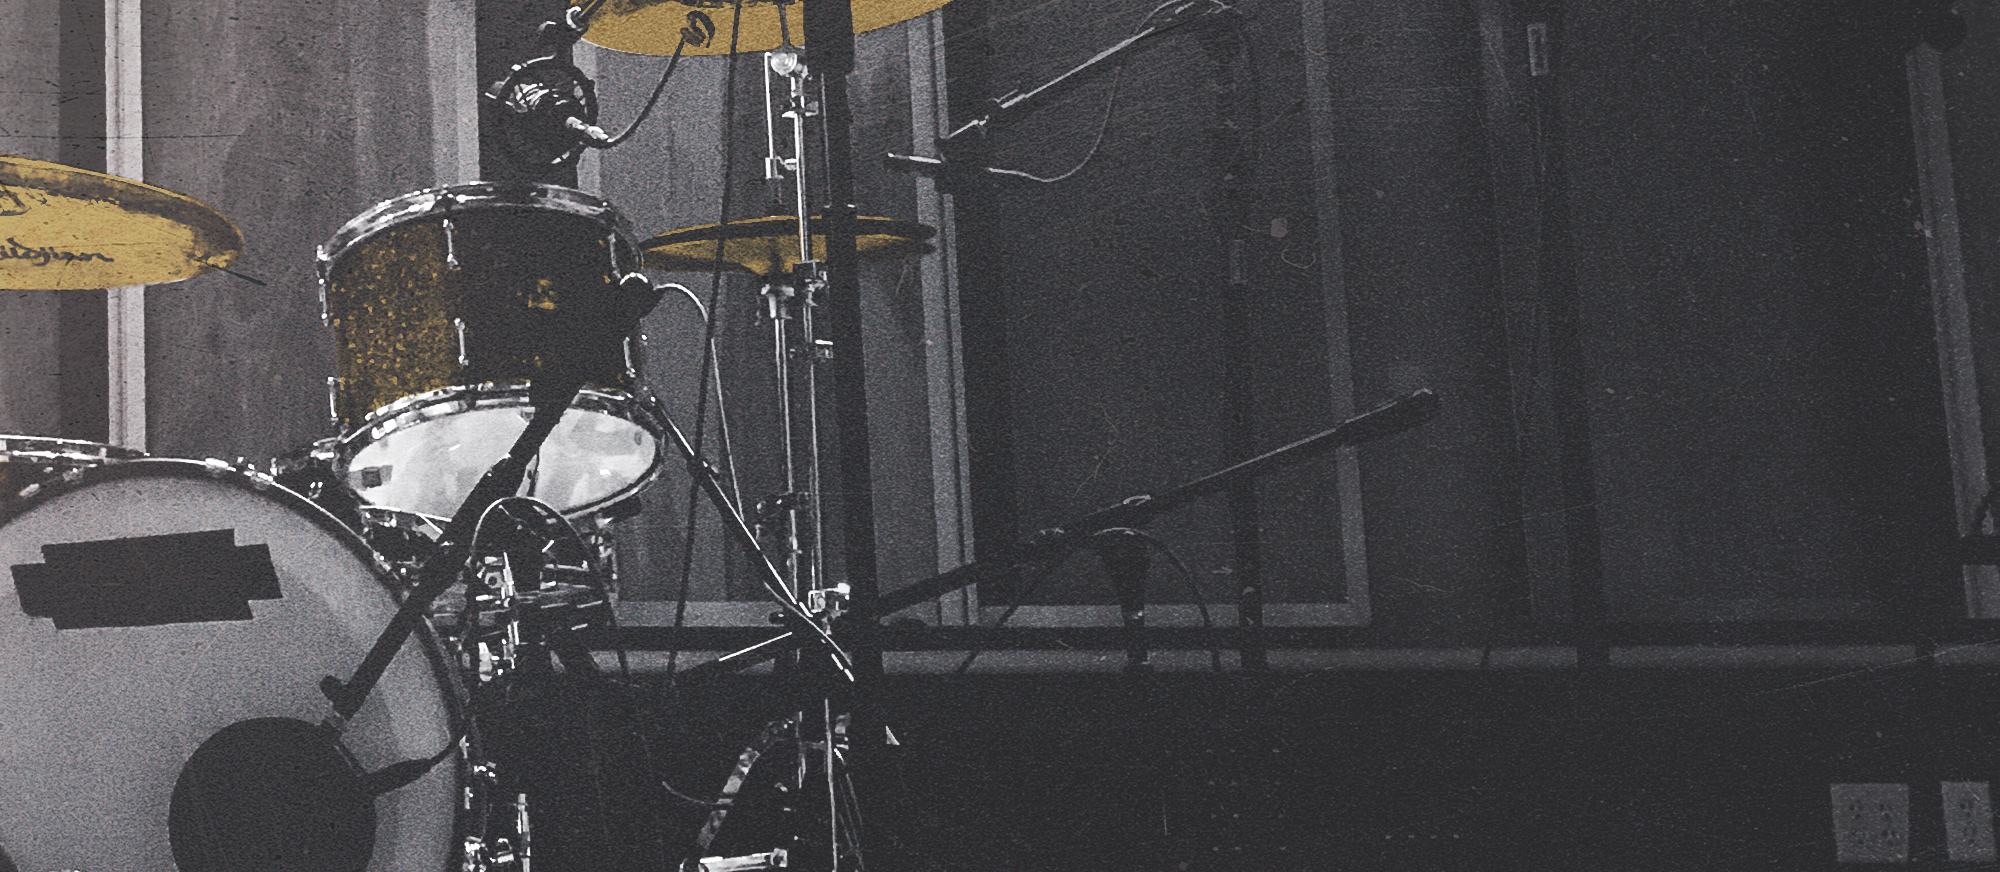 Drum kit in the live room at River City Studio